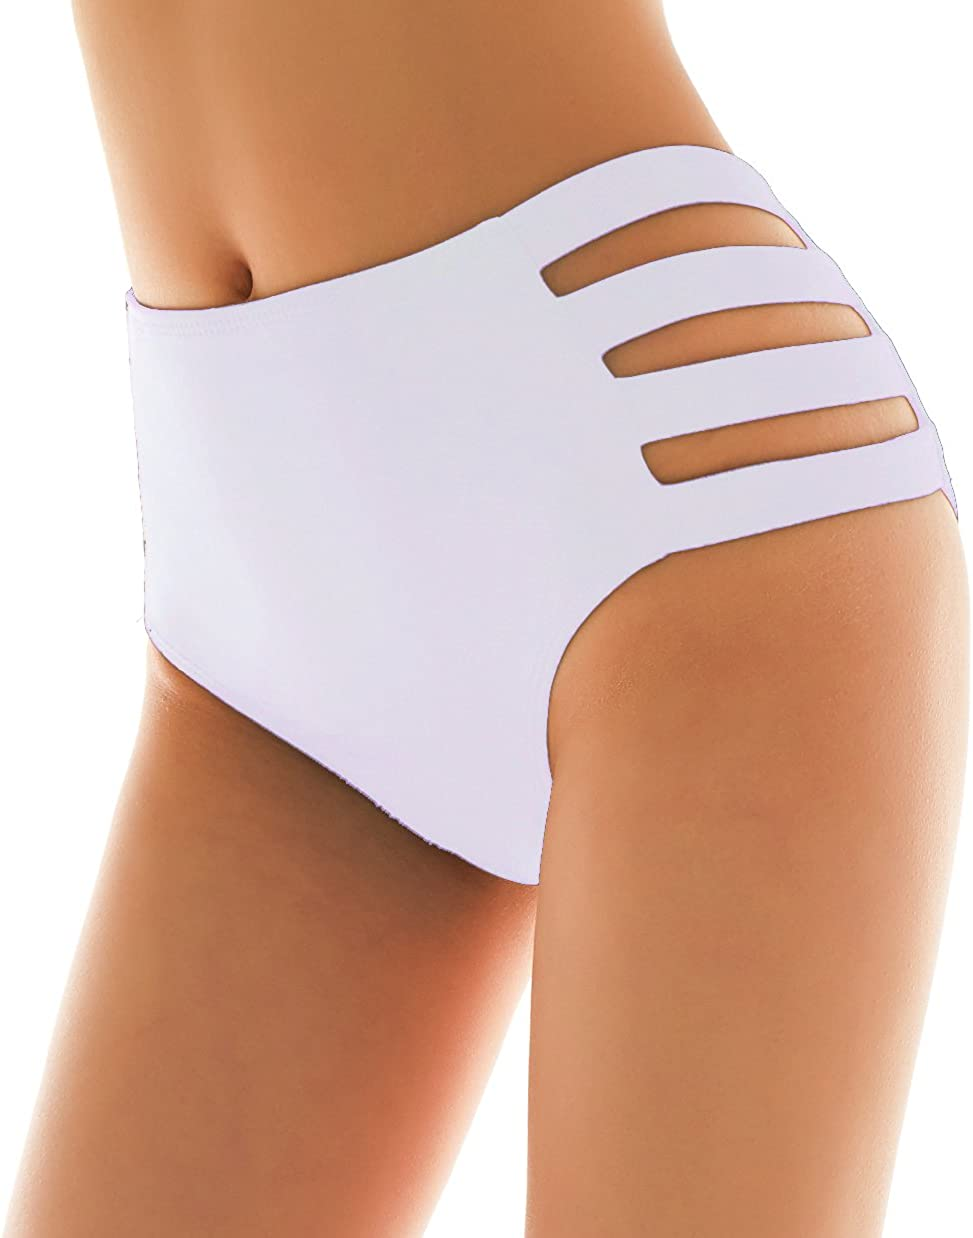 SHEKINI Women's Swimsuit Briefs Solid Black Plus Size Strappy Full Coverage High Waisted Bikini Bottoms